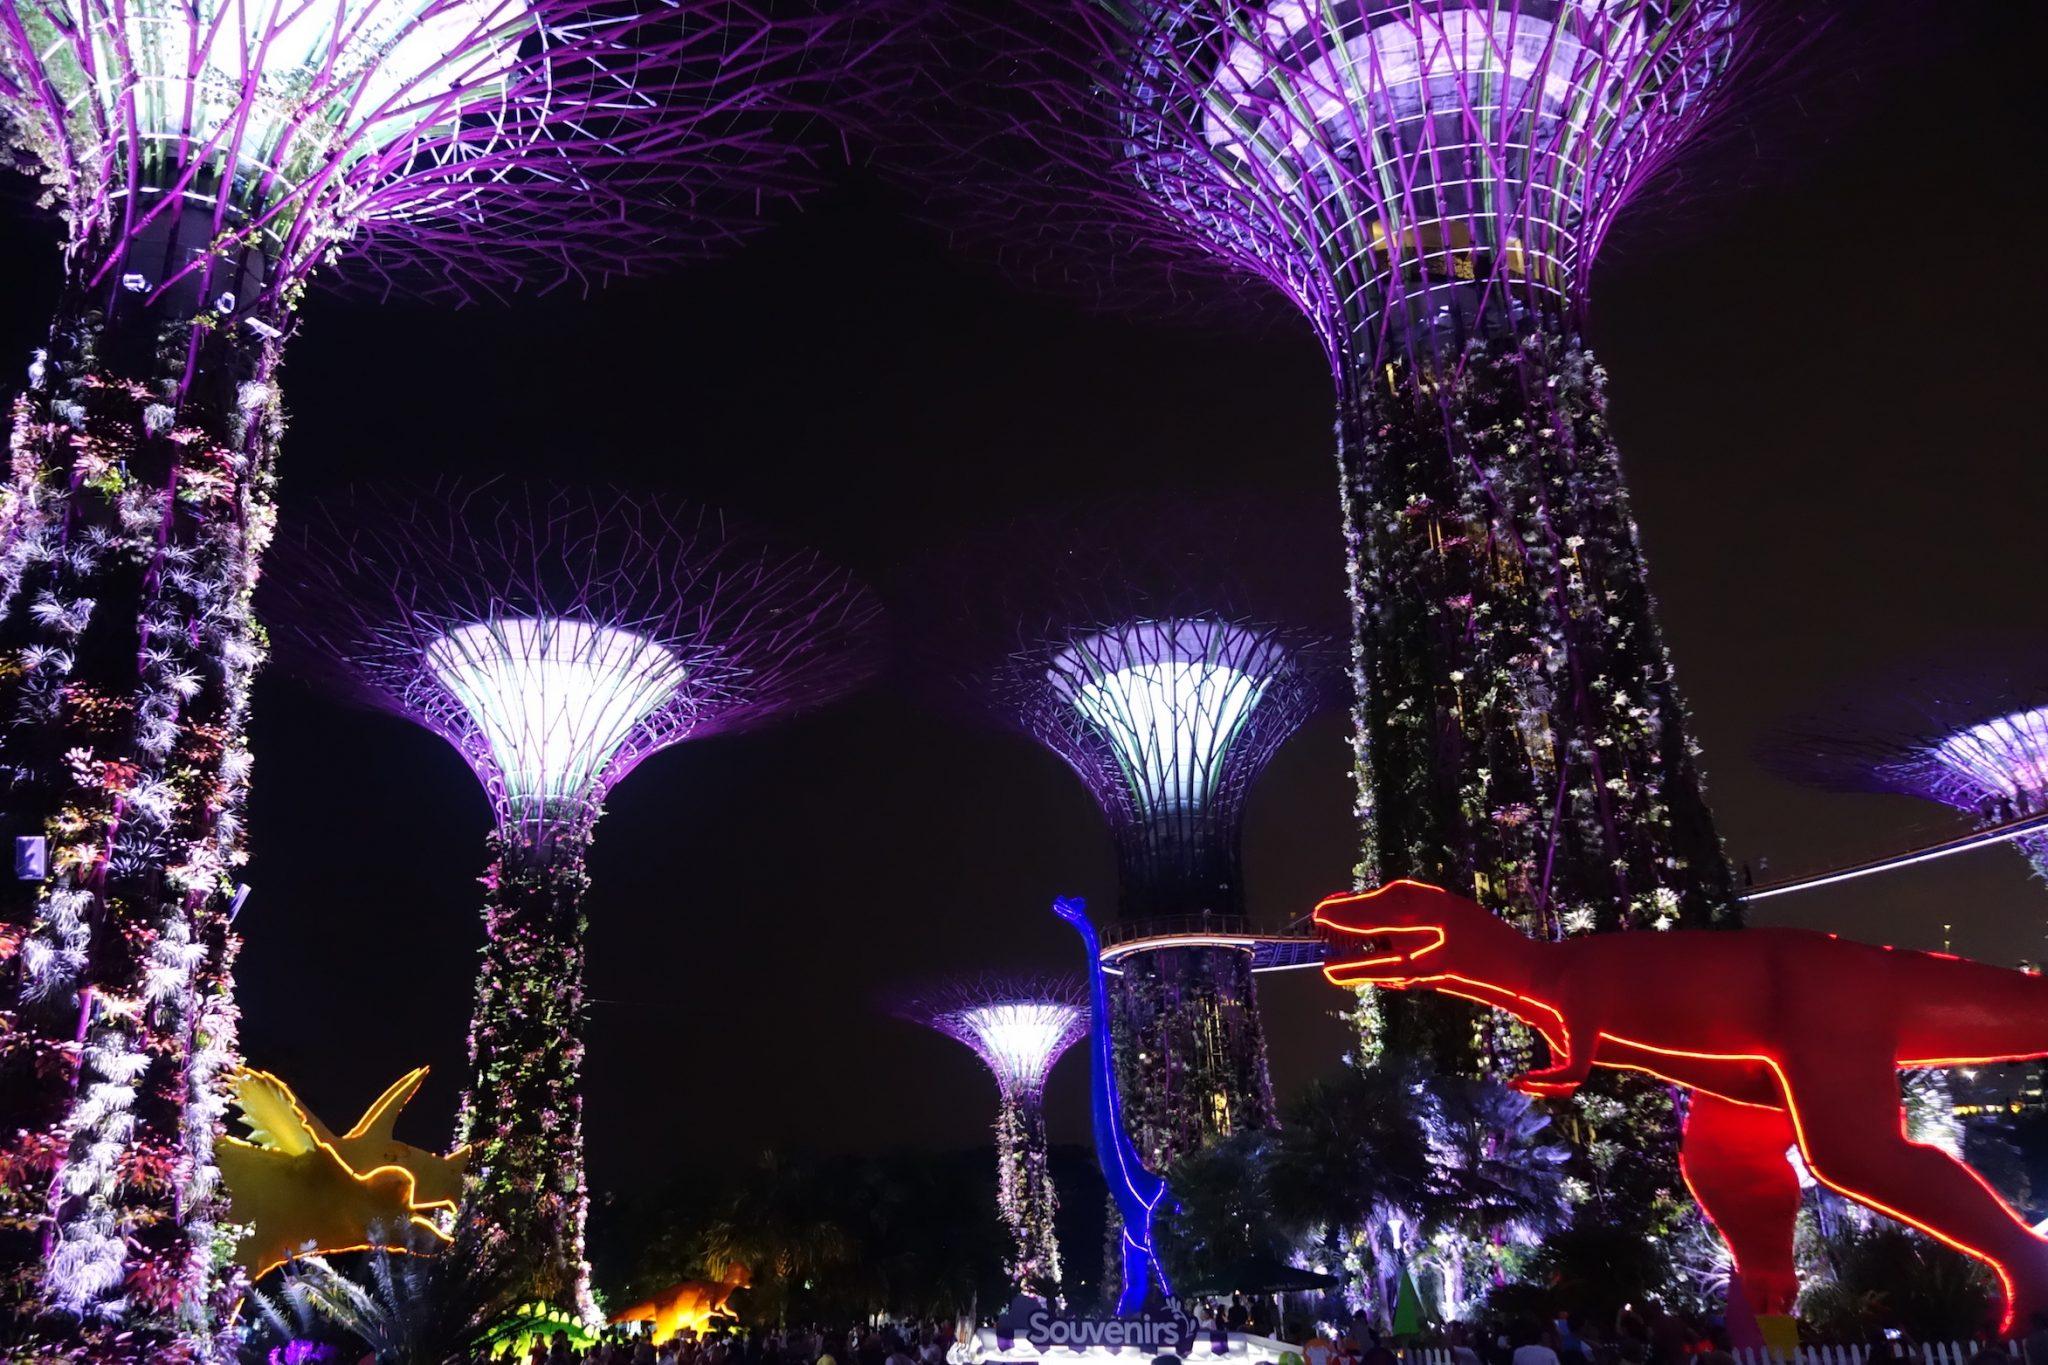 Singapur_GardensbytheBay_SkyTrees_beiNacht_6